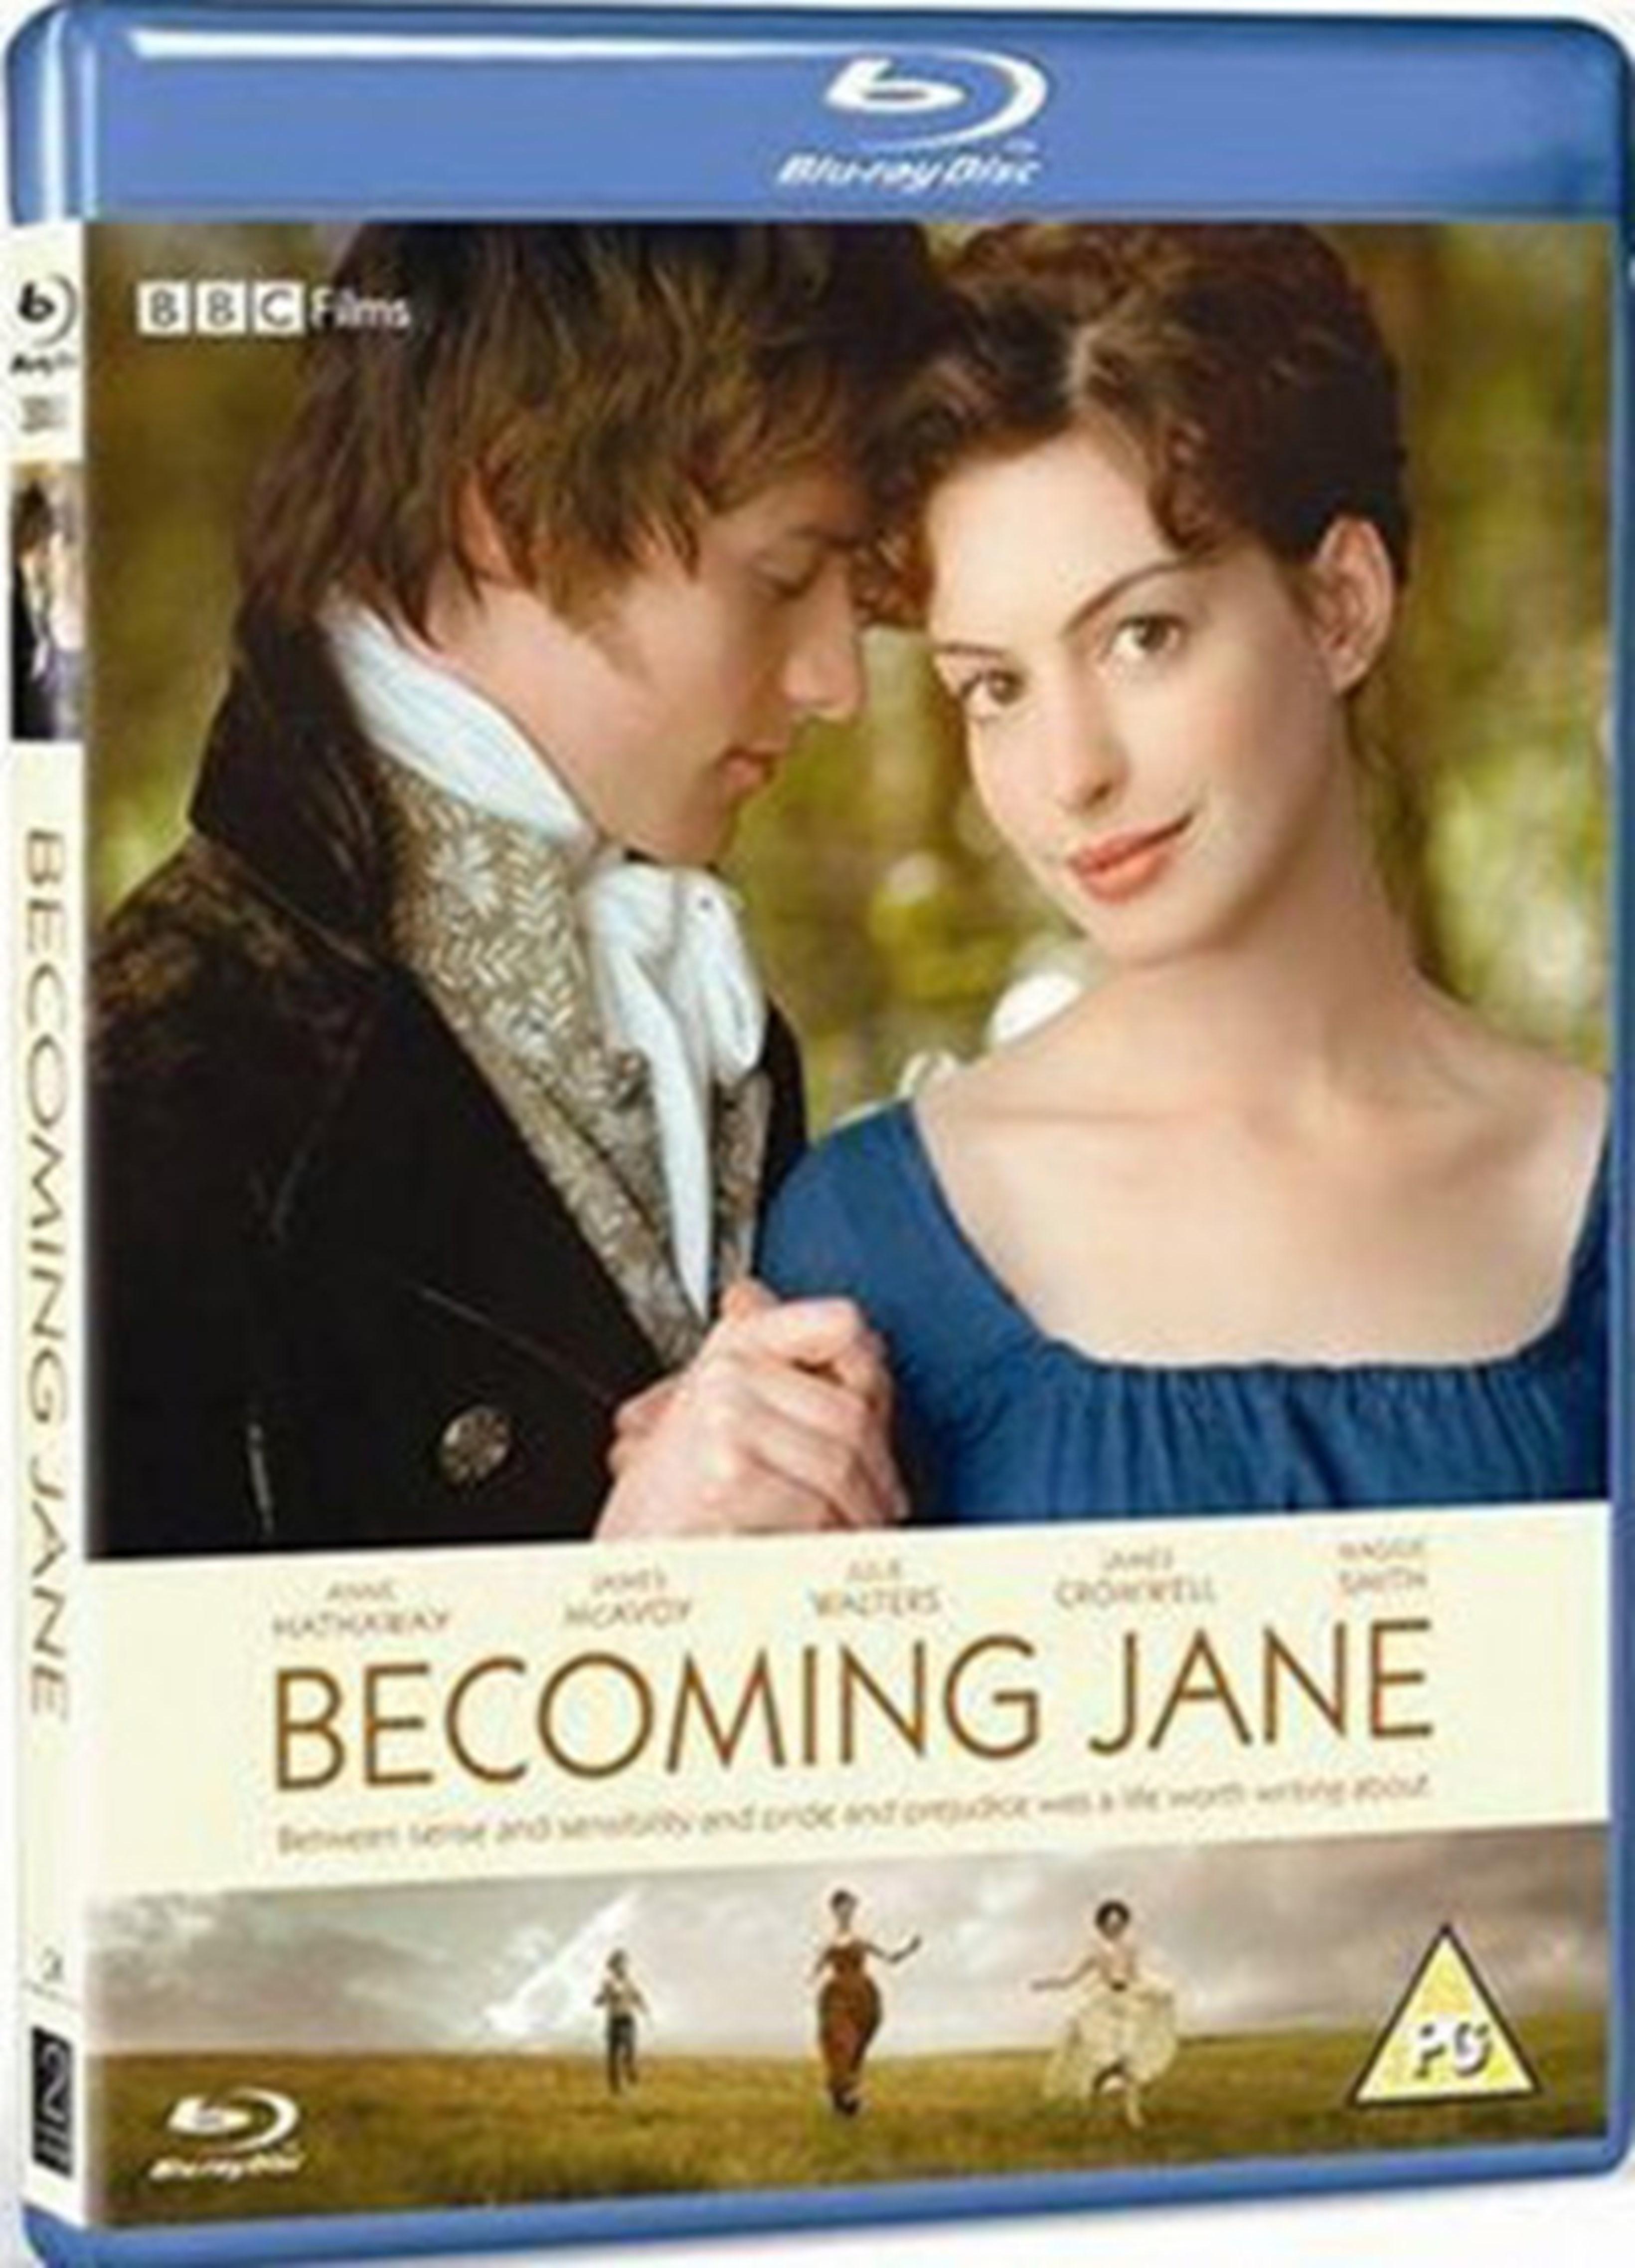 Becoming Jane - 1